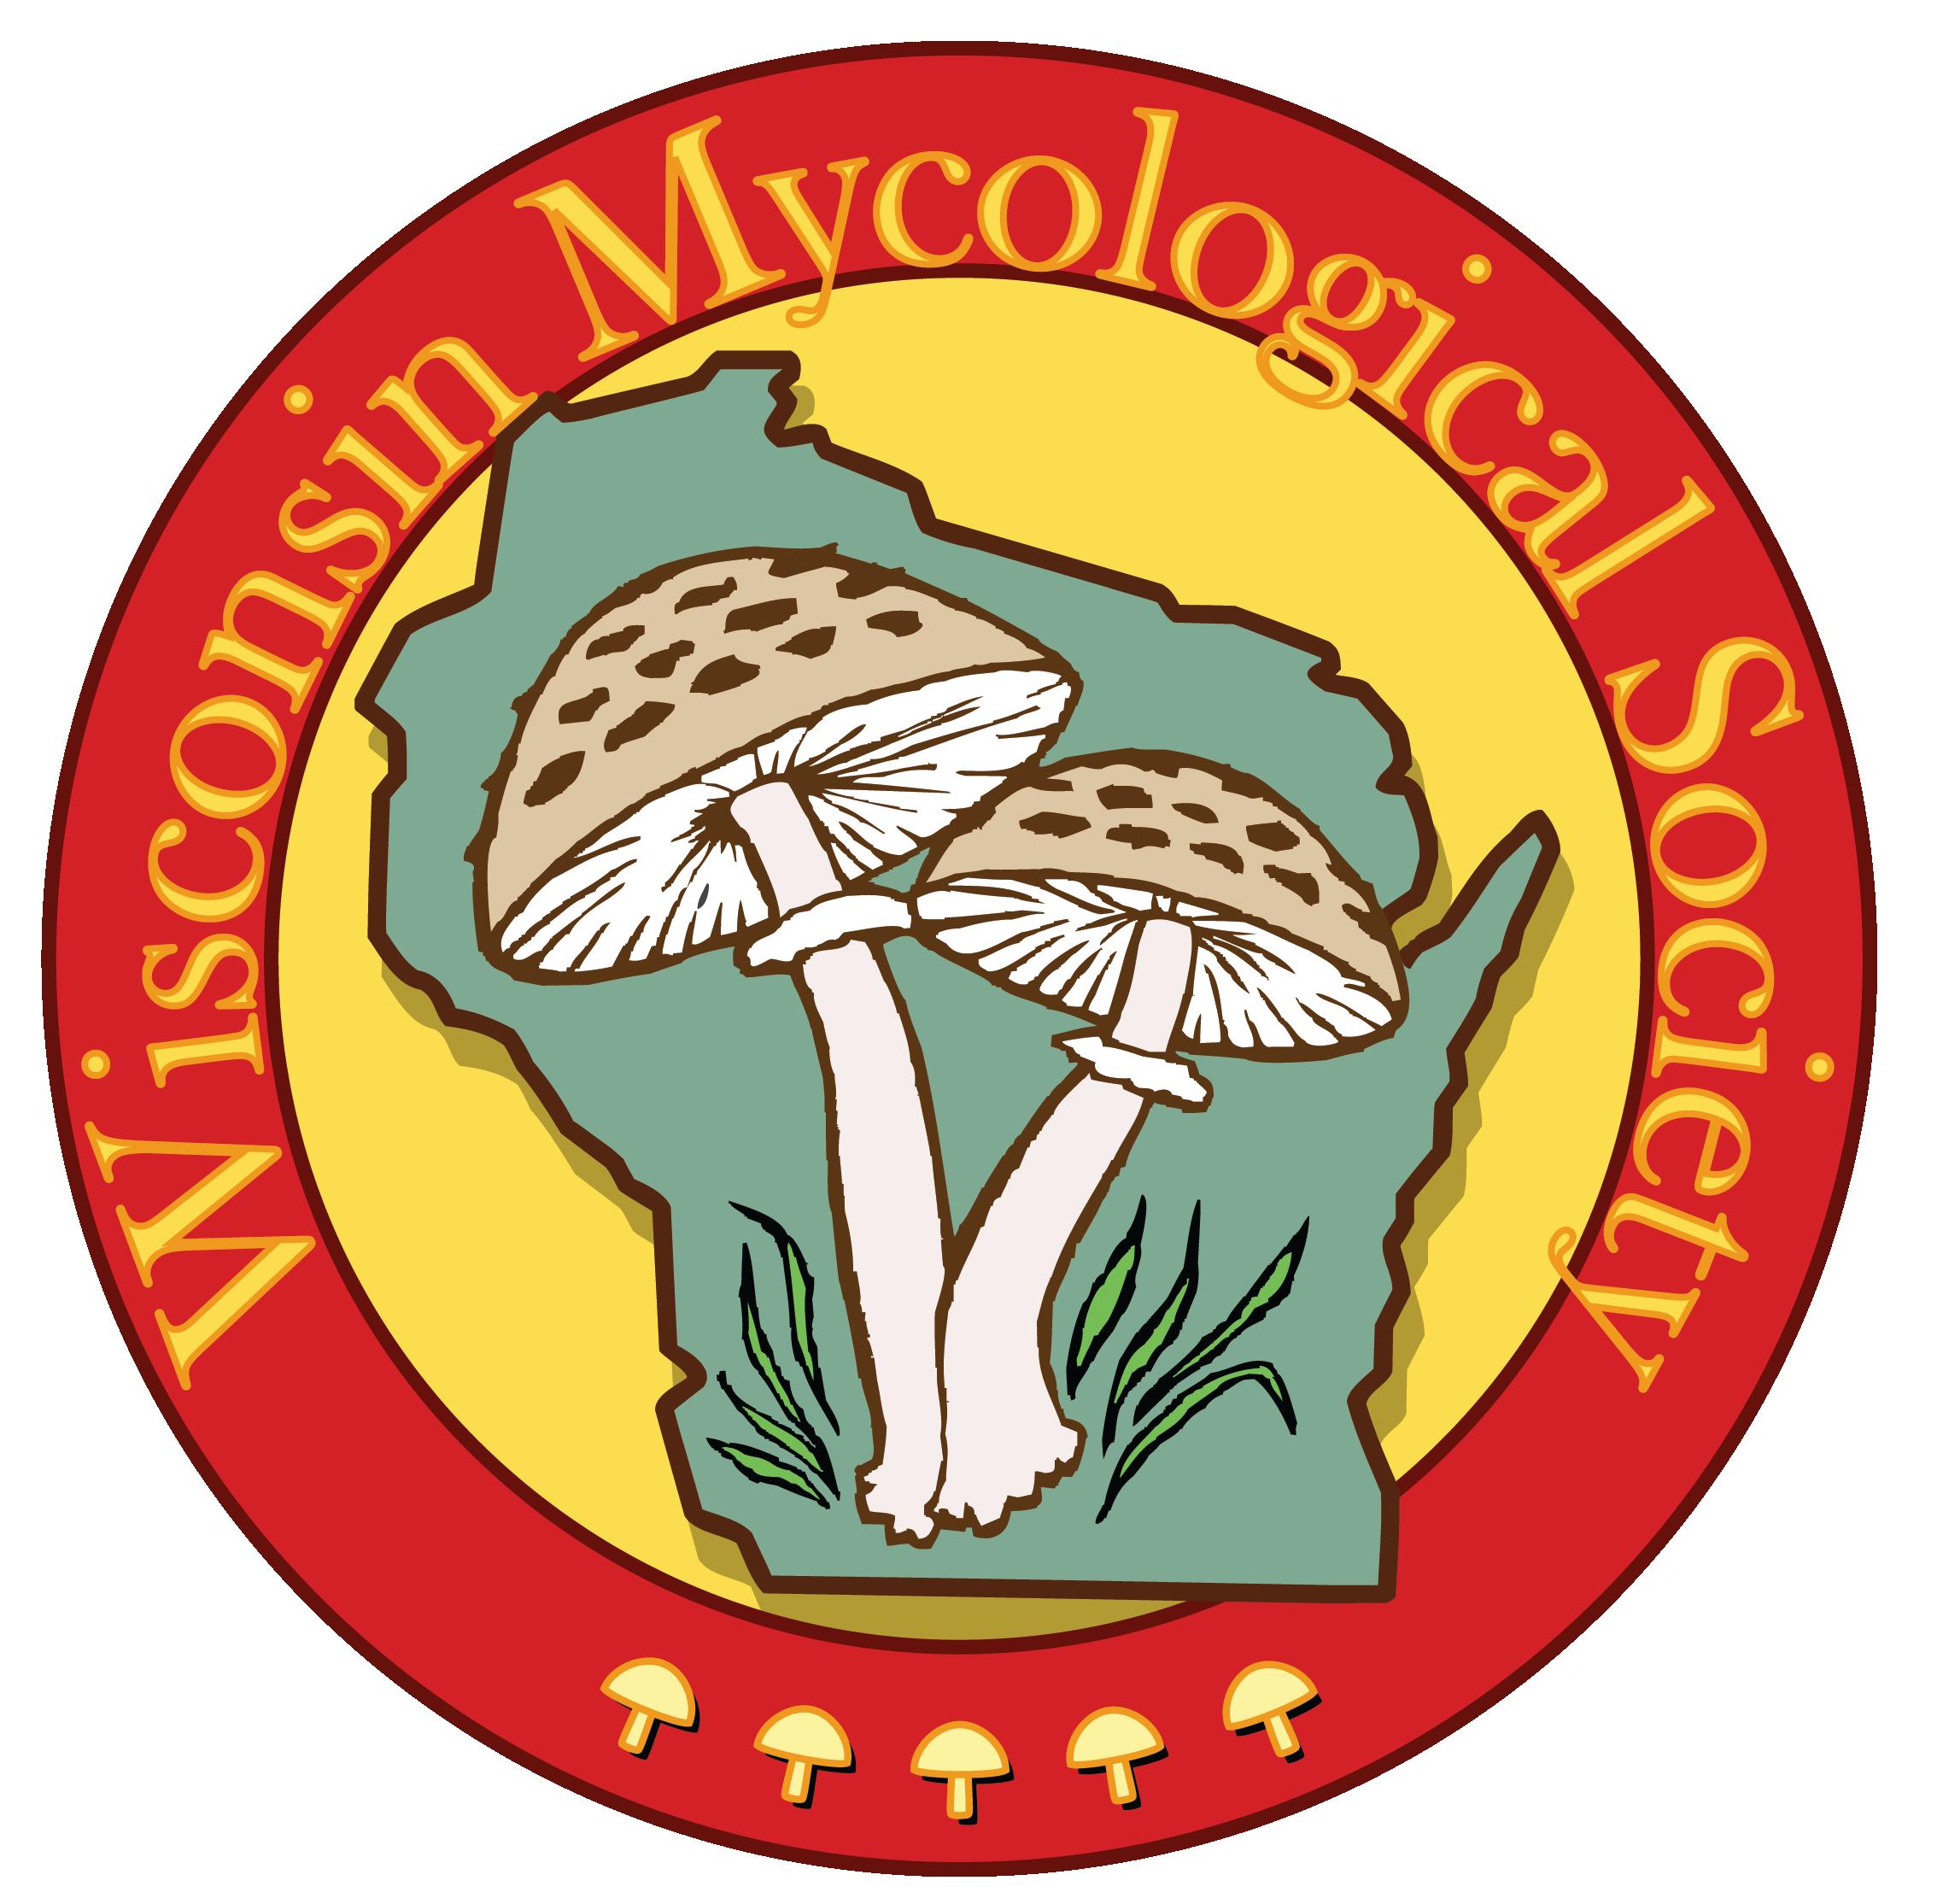 wisconsin mycological society logo